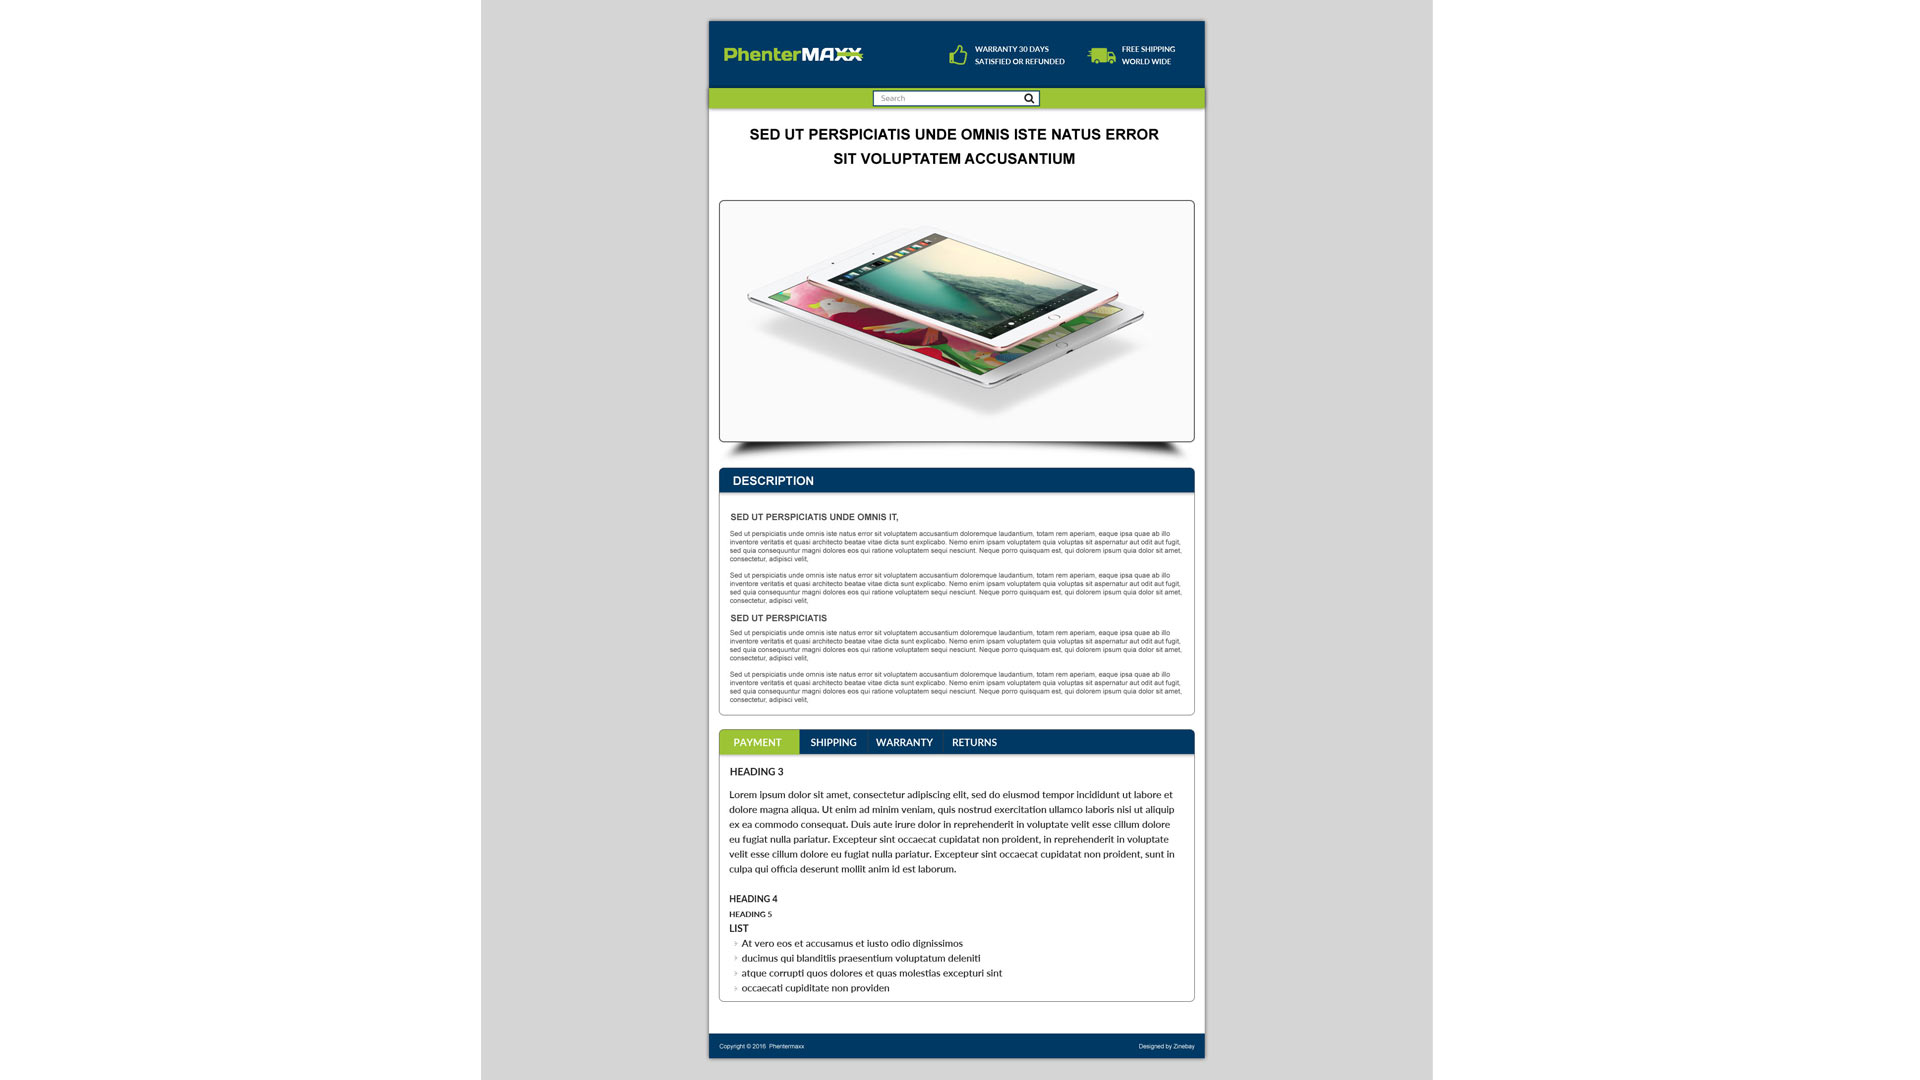 Phentermaxx listing ebay template zeinebay for Ebay template design software